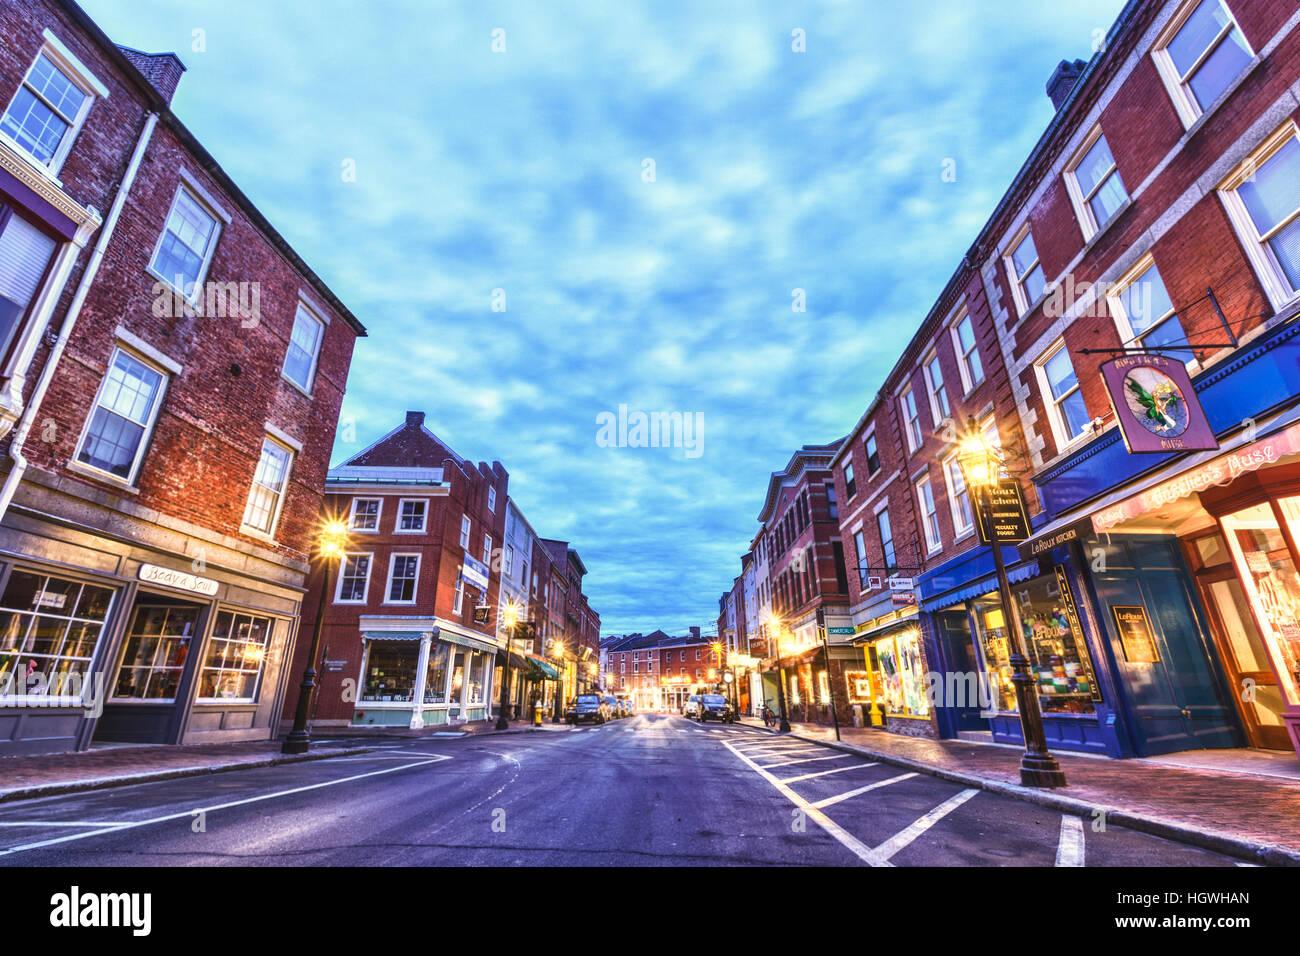 New Hampshire Portsmouth Market Street Stock Photos & New Hampshire ...